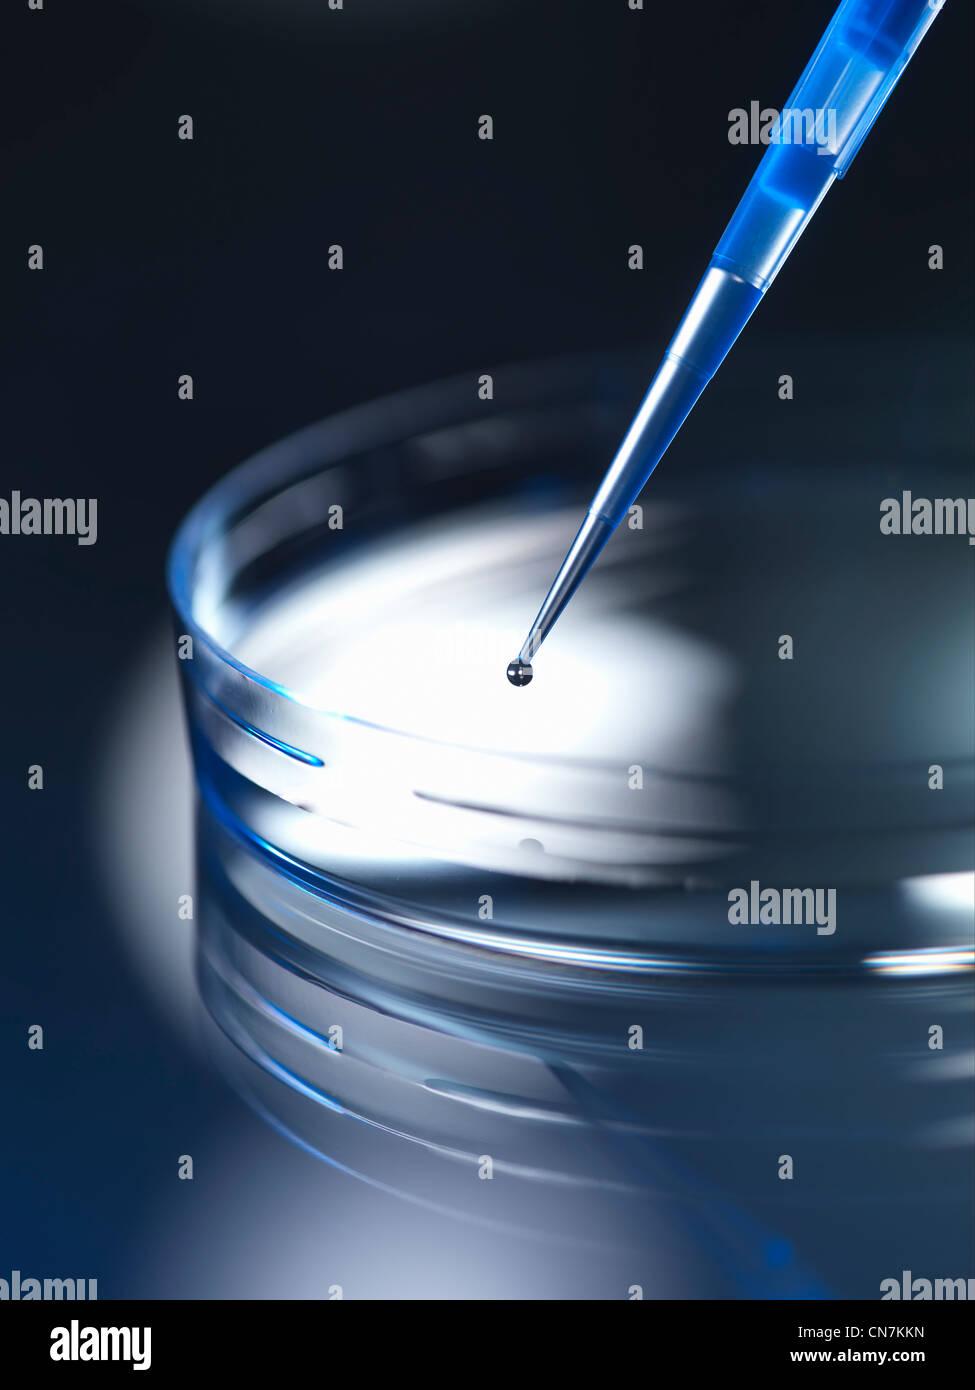 Close up of dropper in petri dish - Stock Image